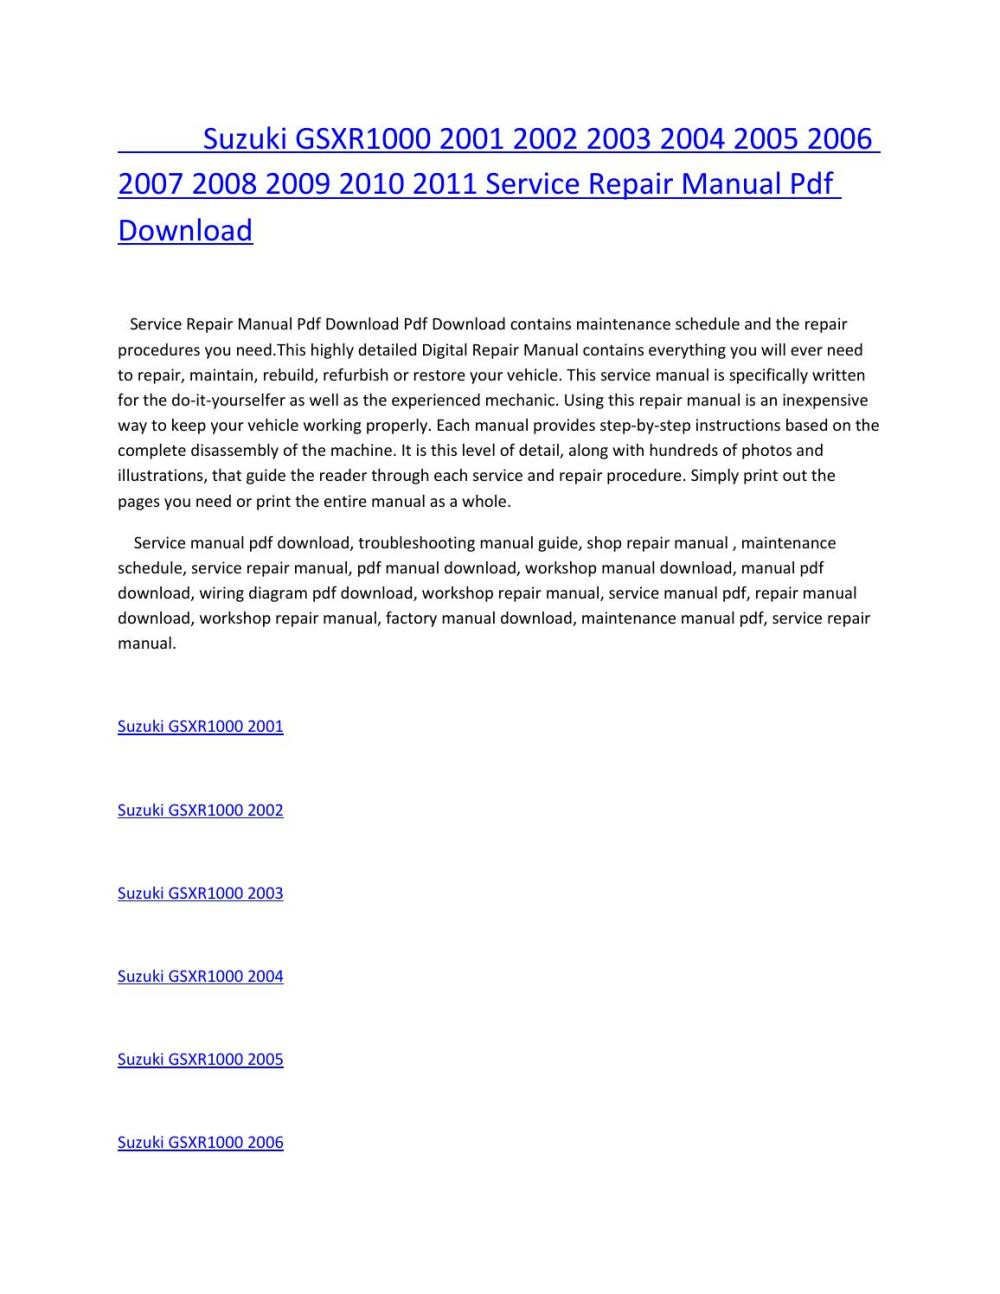 medium resolution of suzuki gsxr1000 2001 2002 2003 2004 2005 2006 2007 2008 2009 2010 2011 service repair manual pdf dow by amurgului issuu